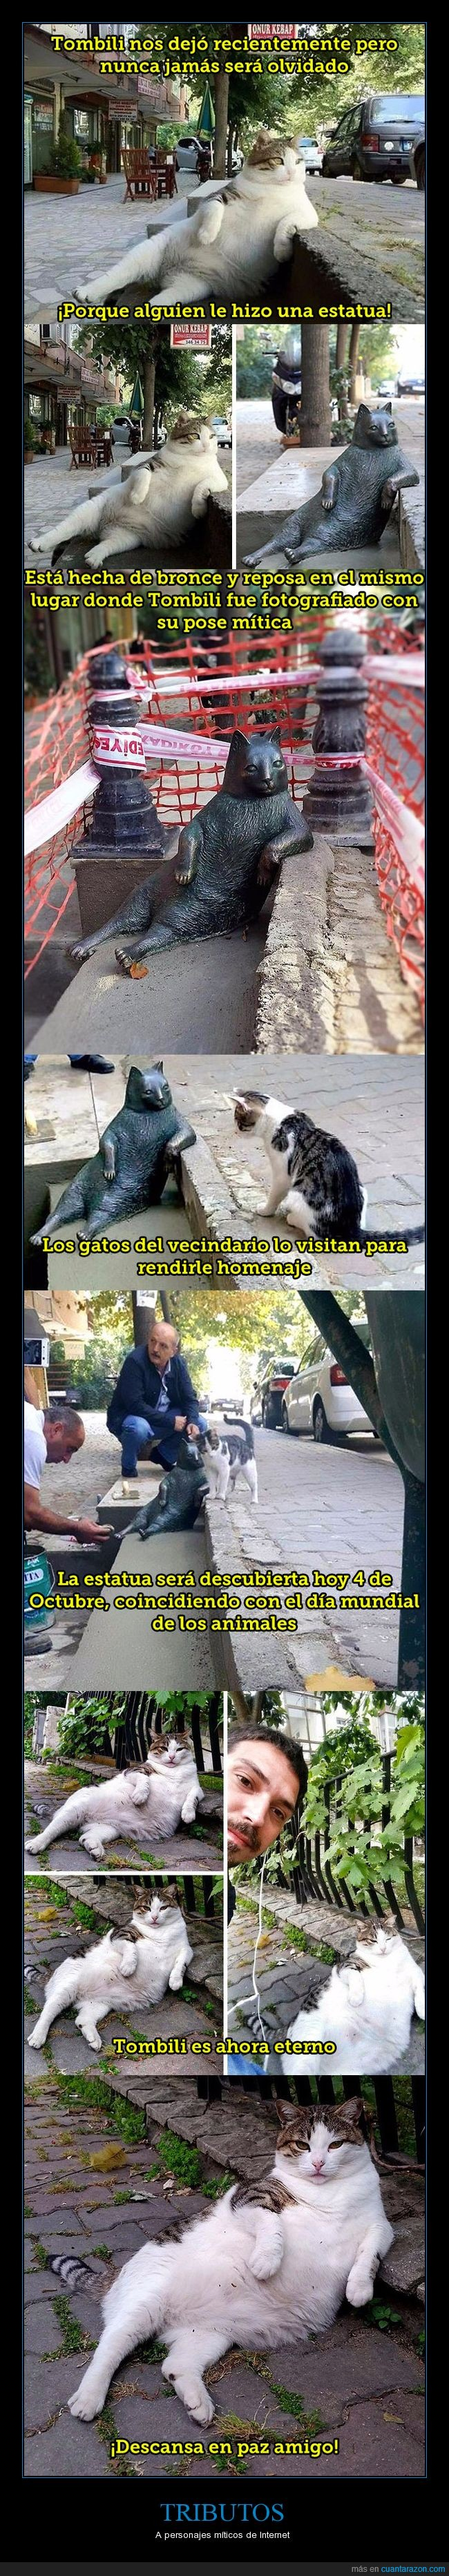 Estambul,estatua,gato,homenaje,tombili,tributo